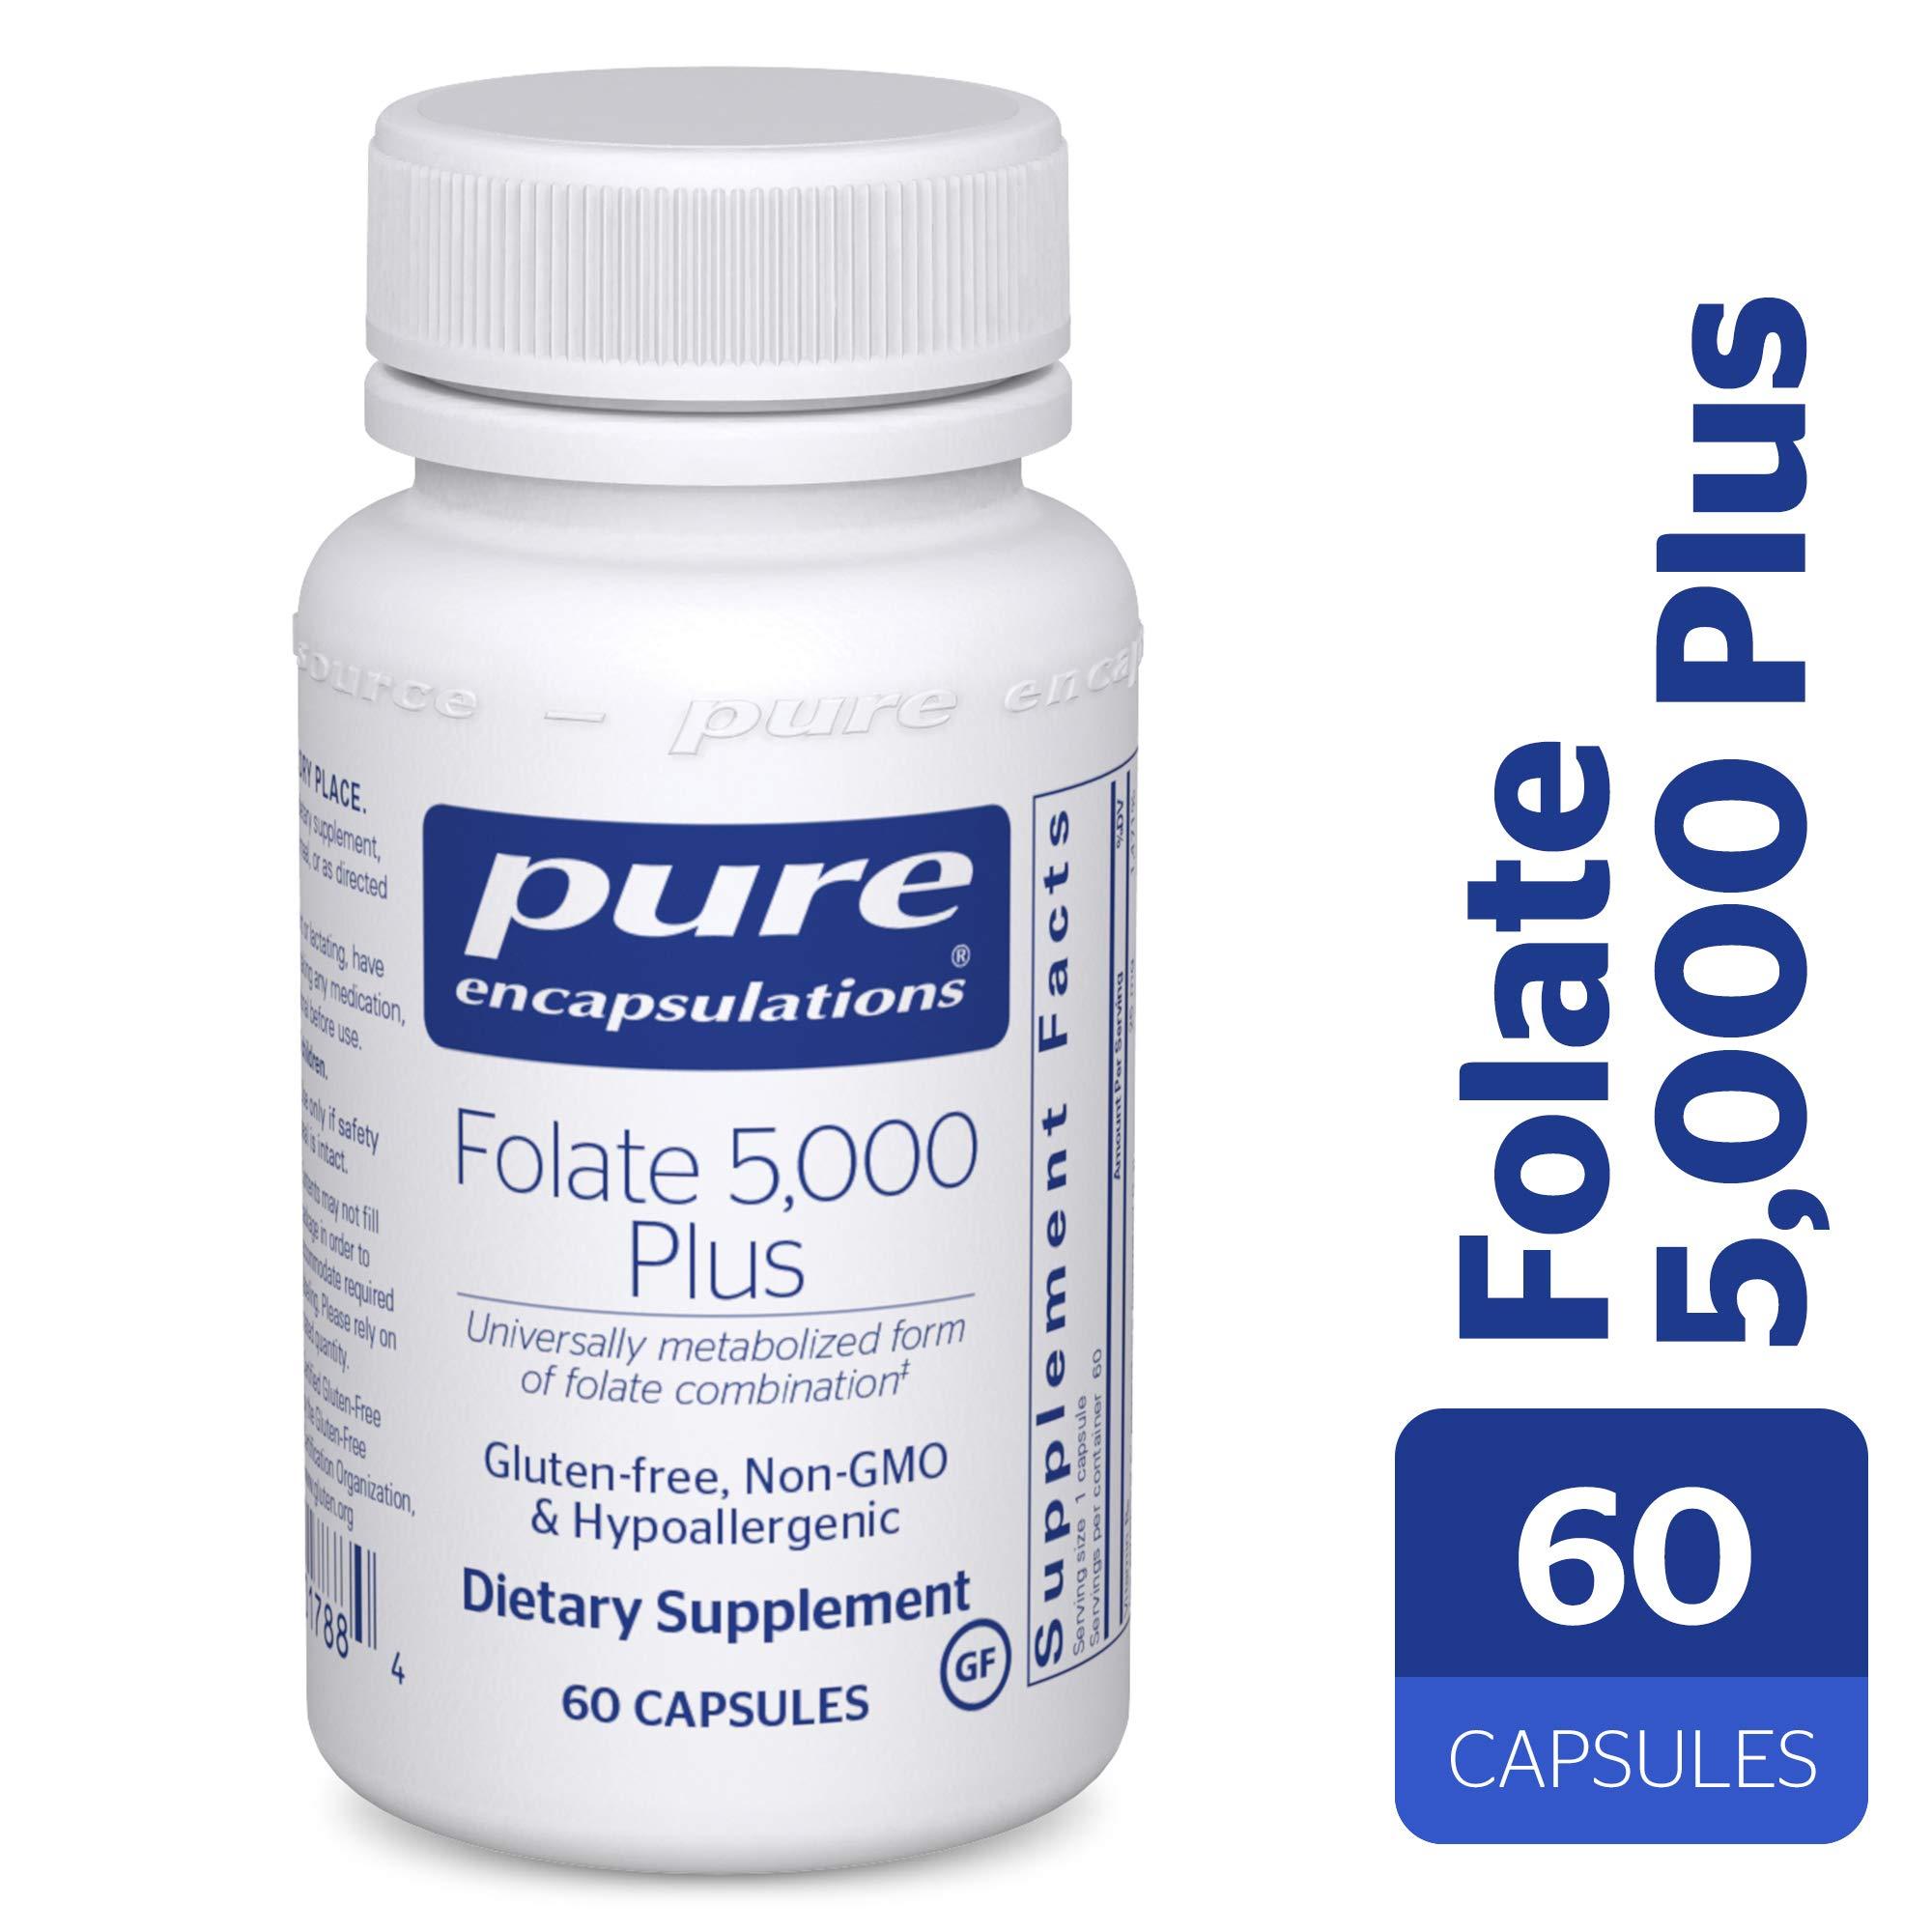 Pure Encapsulations - Folate 5,000 Plus - Activated Folate, Vitamin B12 and B6 Combination - 60 Capsules